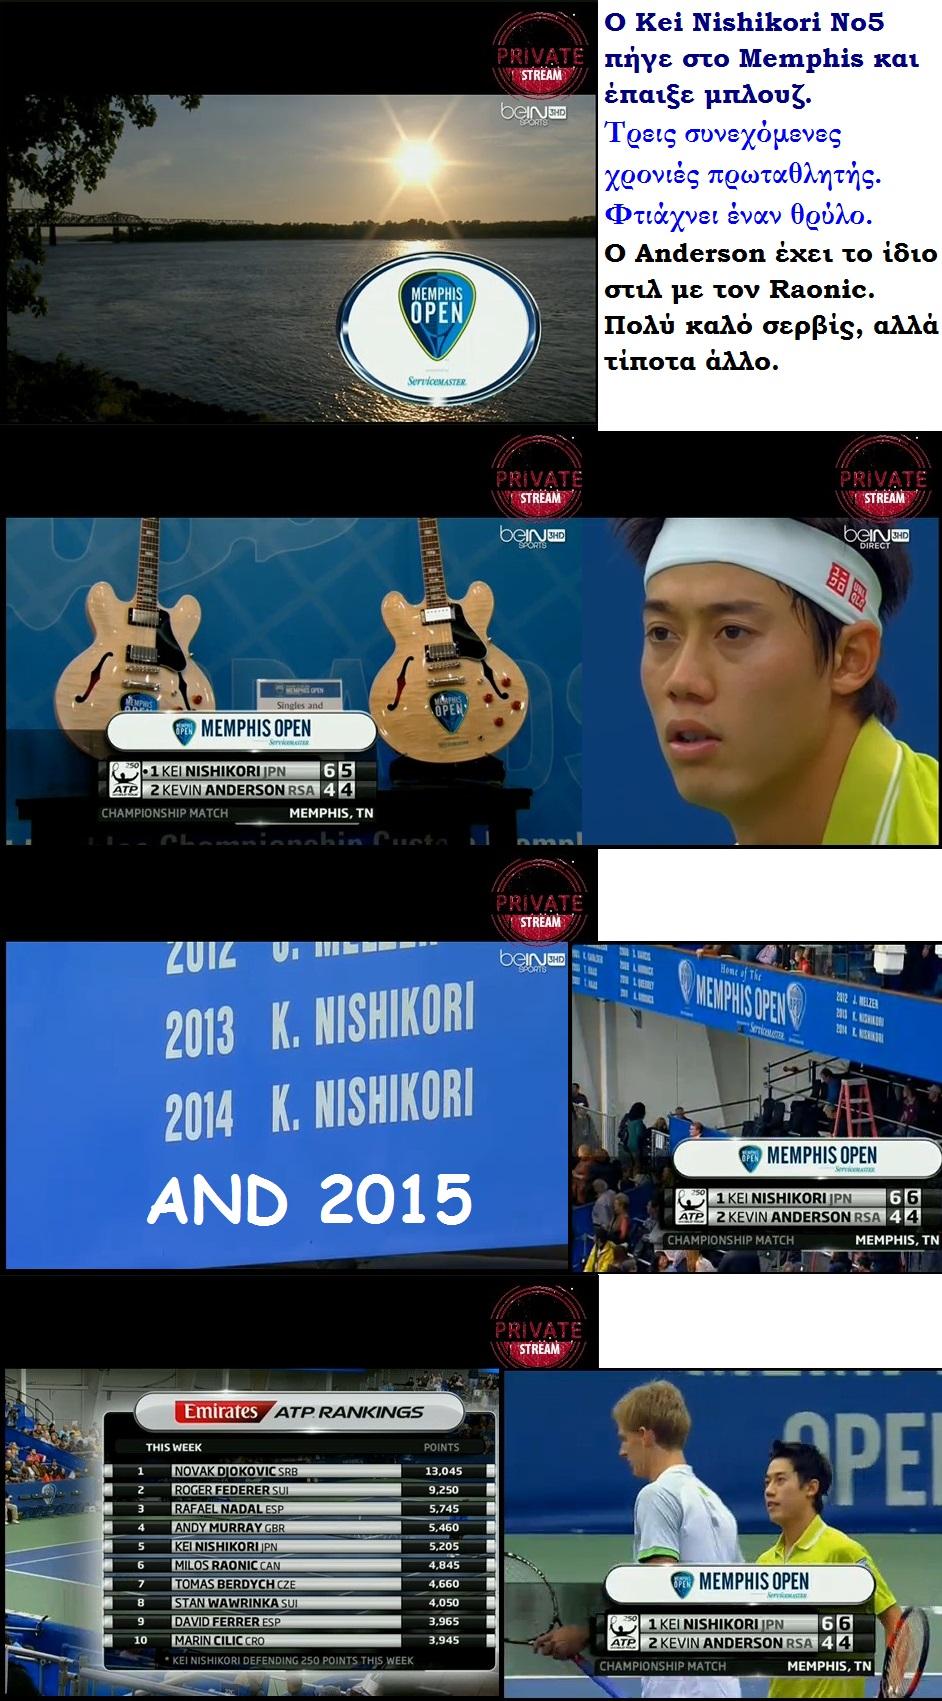 TENNIS ATP MAMPHIS OPEN KEI NISHIKORI WIN ANDERSON 01 160215